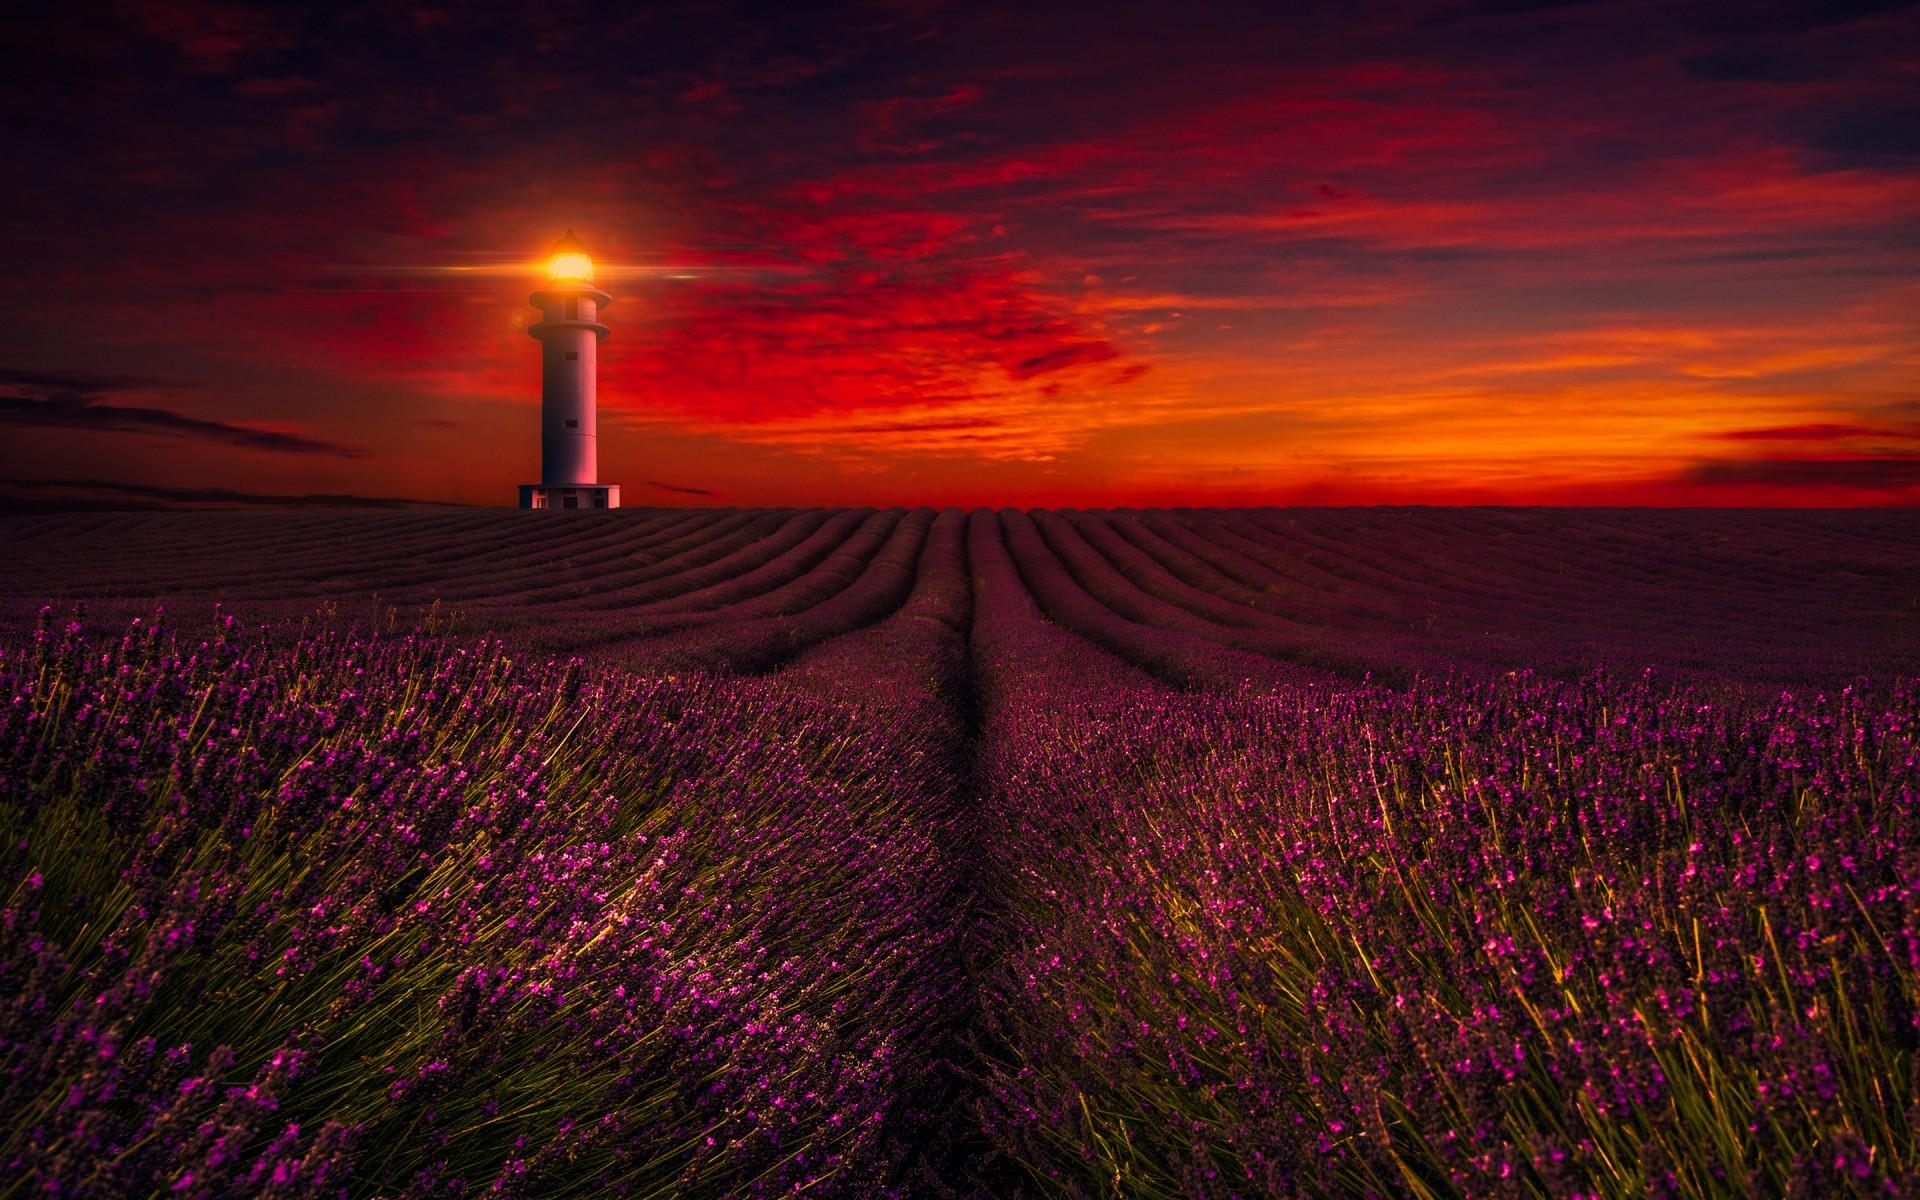 Fall Flowers Wallpaper Iphone Sunset Lavender Field Lighthouse 5k Wallpapers Hd